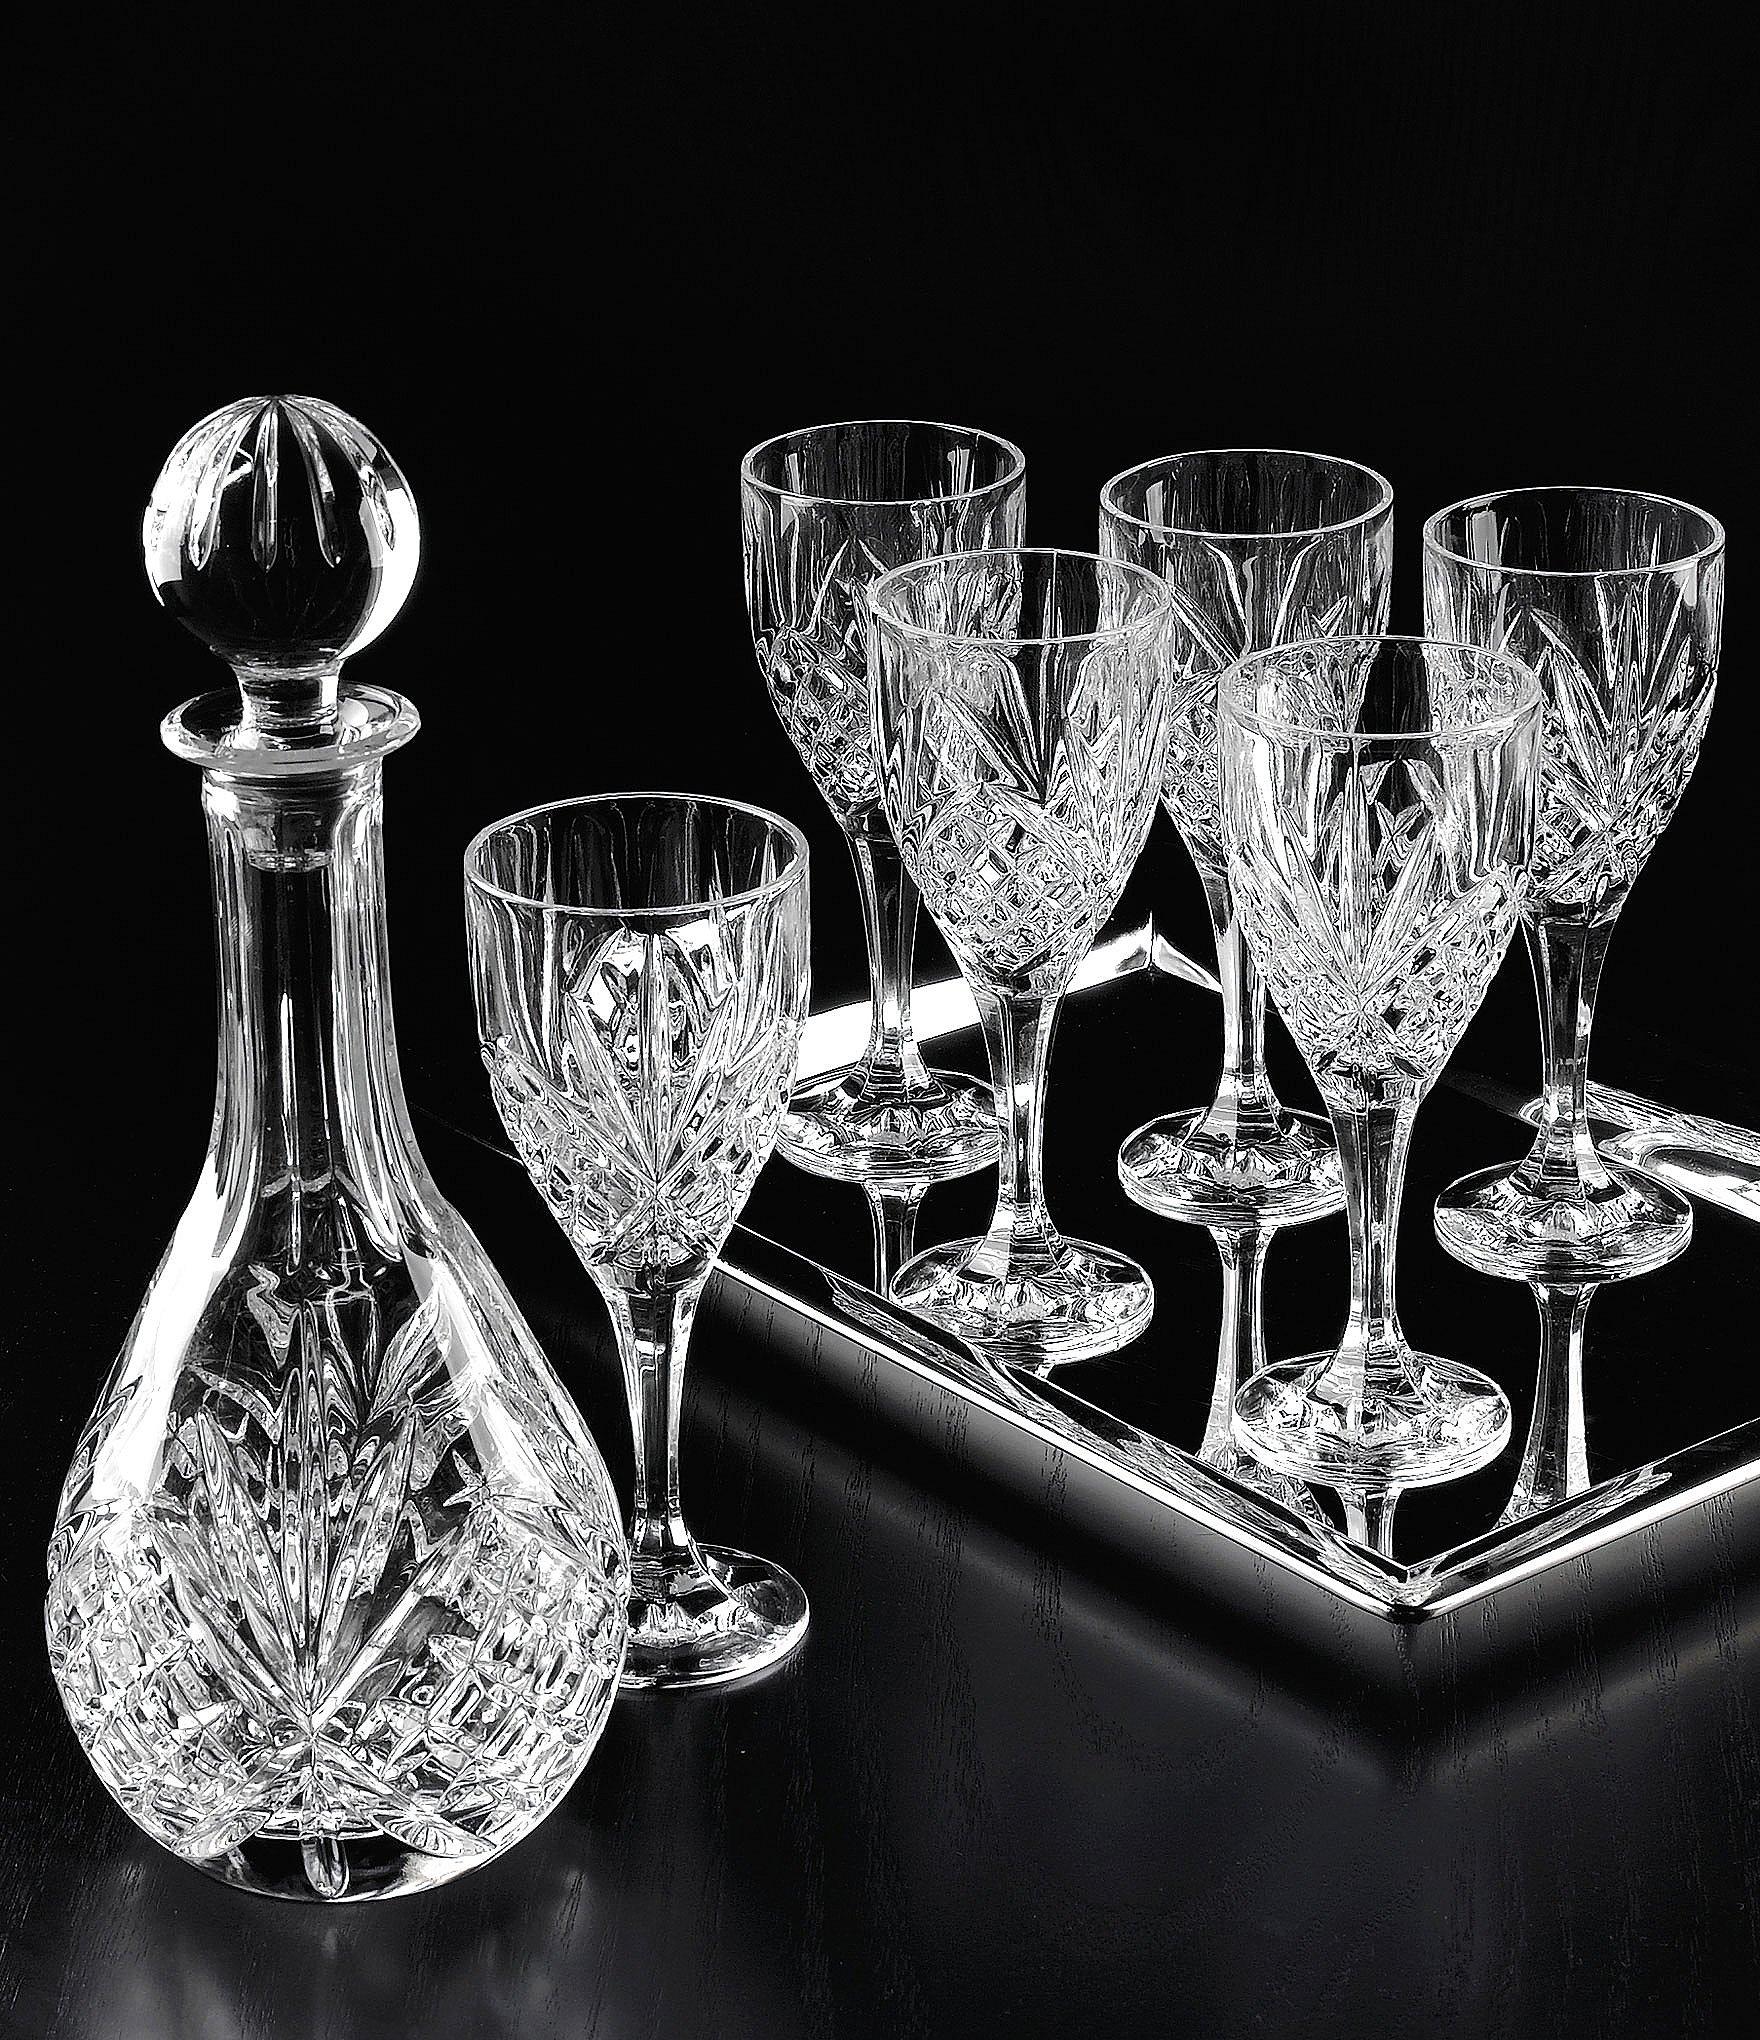 godinger dublin diamond cut crystal 8 piece wine set. Black Bedroom Furniture Sets. Home Design Ideas